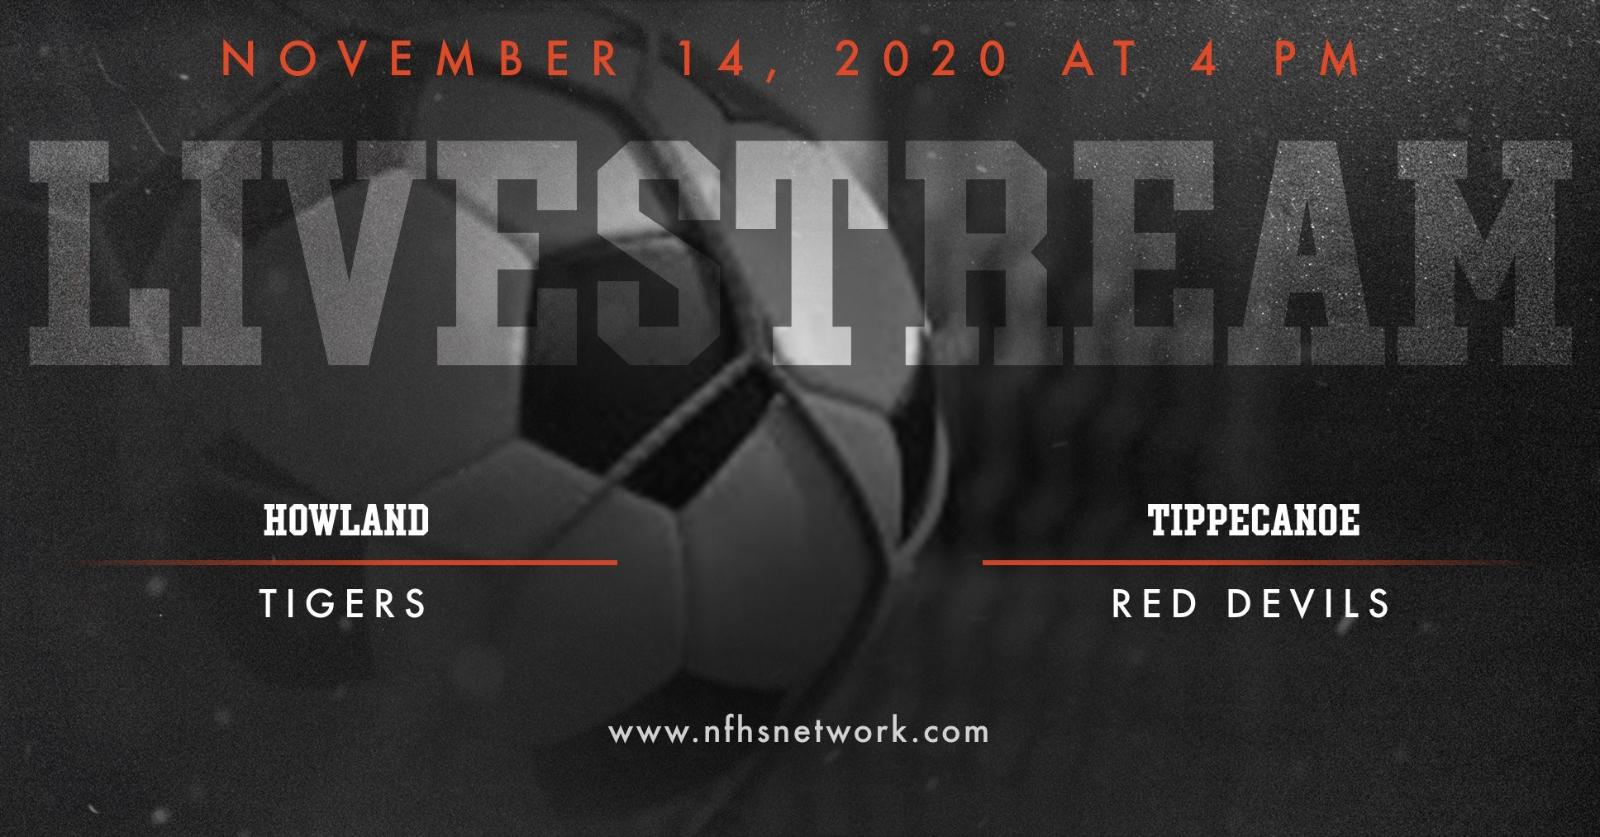 LIVESTREAM: Boys Soccer State Championship Game, 11/14/2020 4 pm